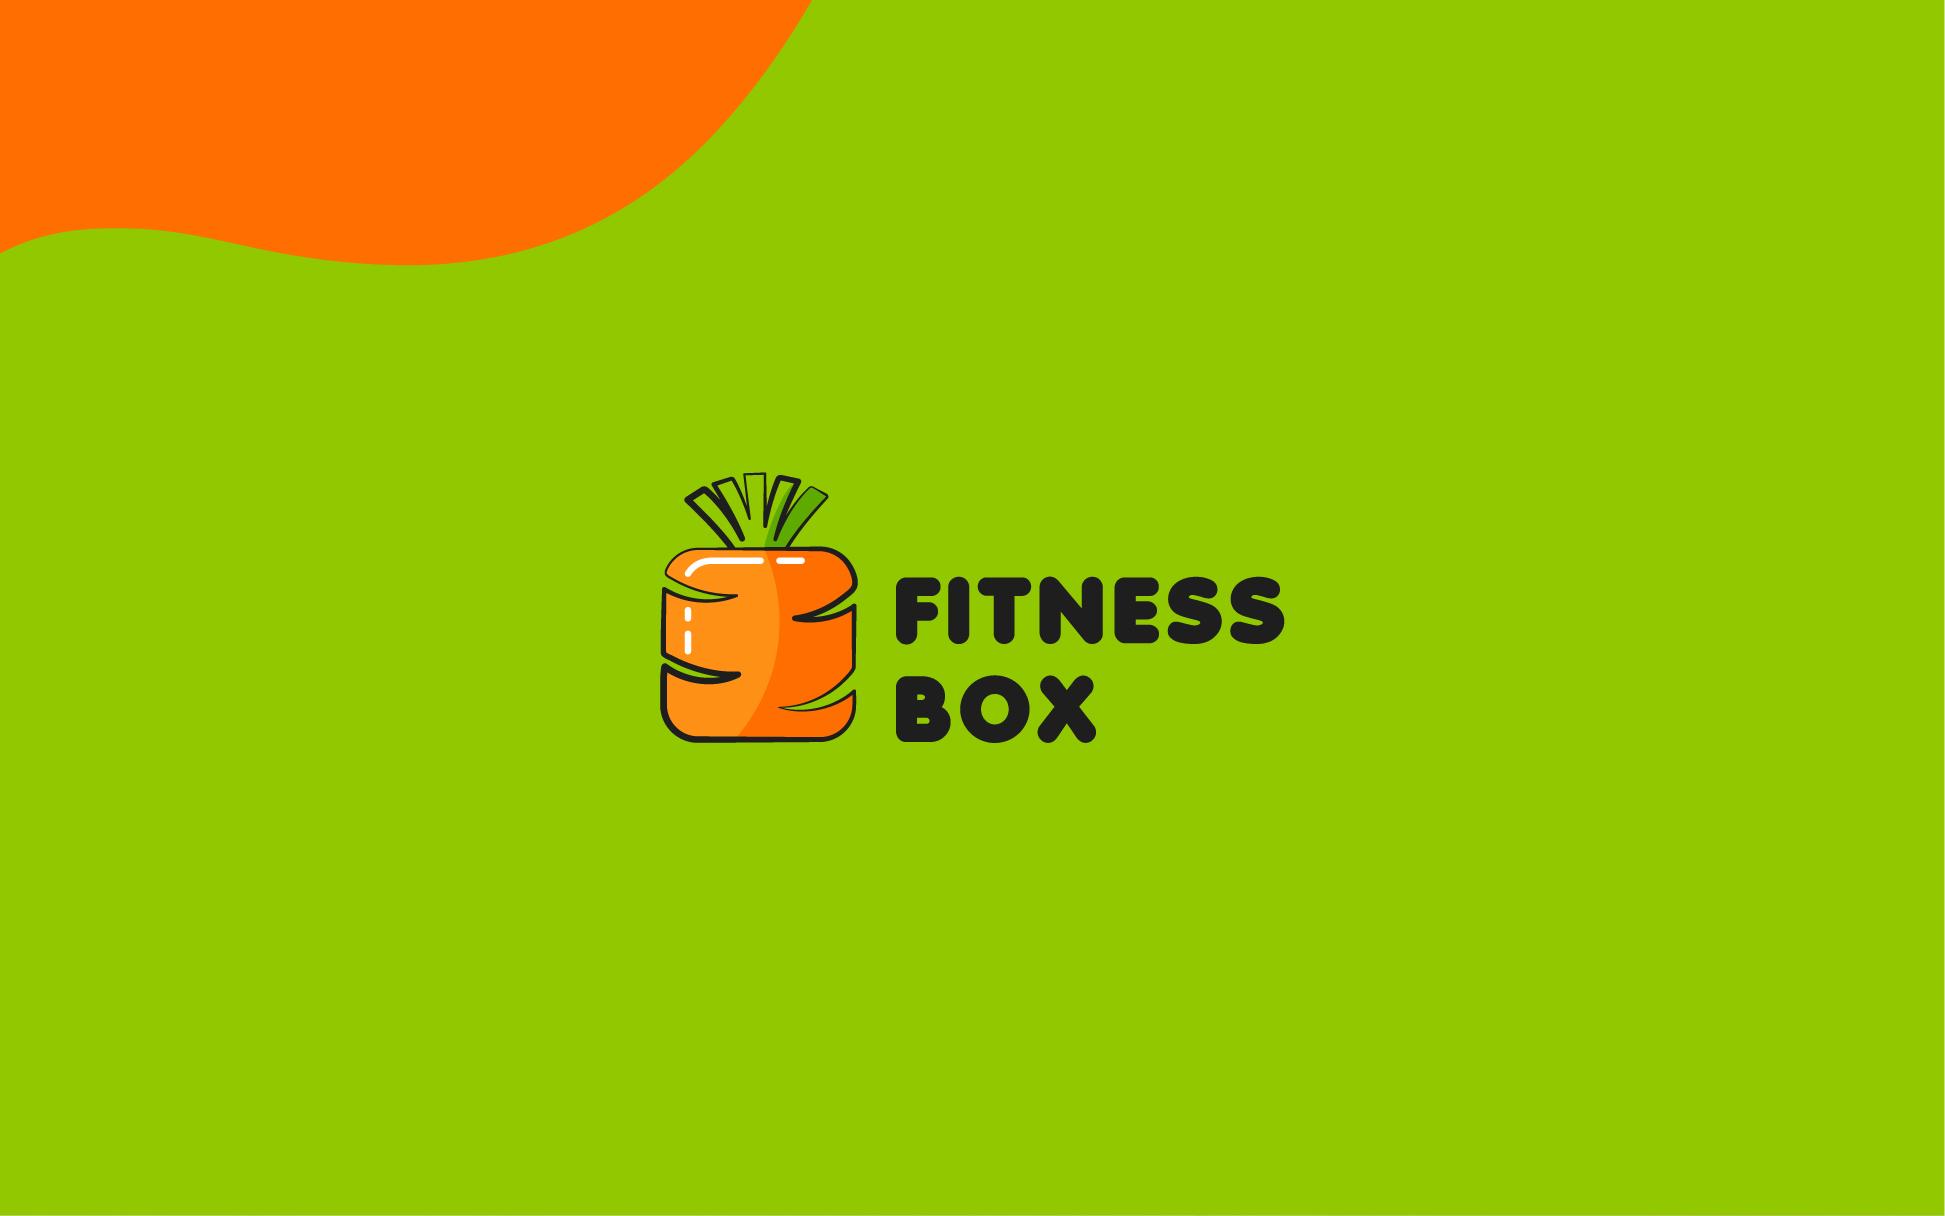 fitness box 2